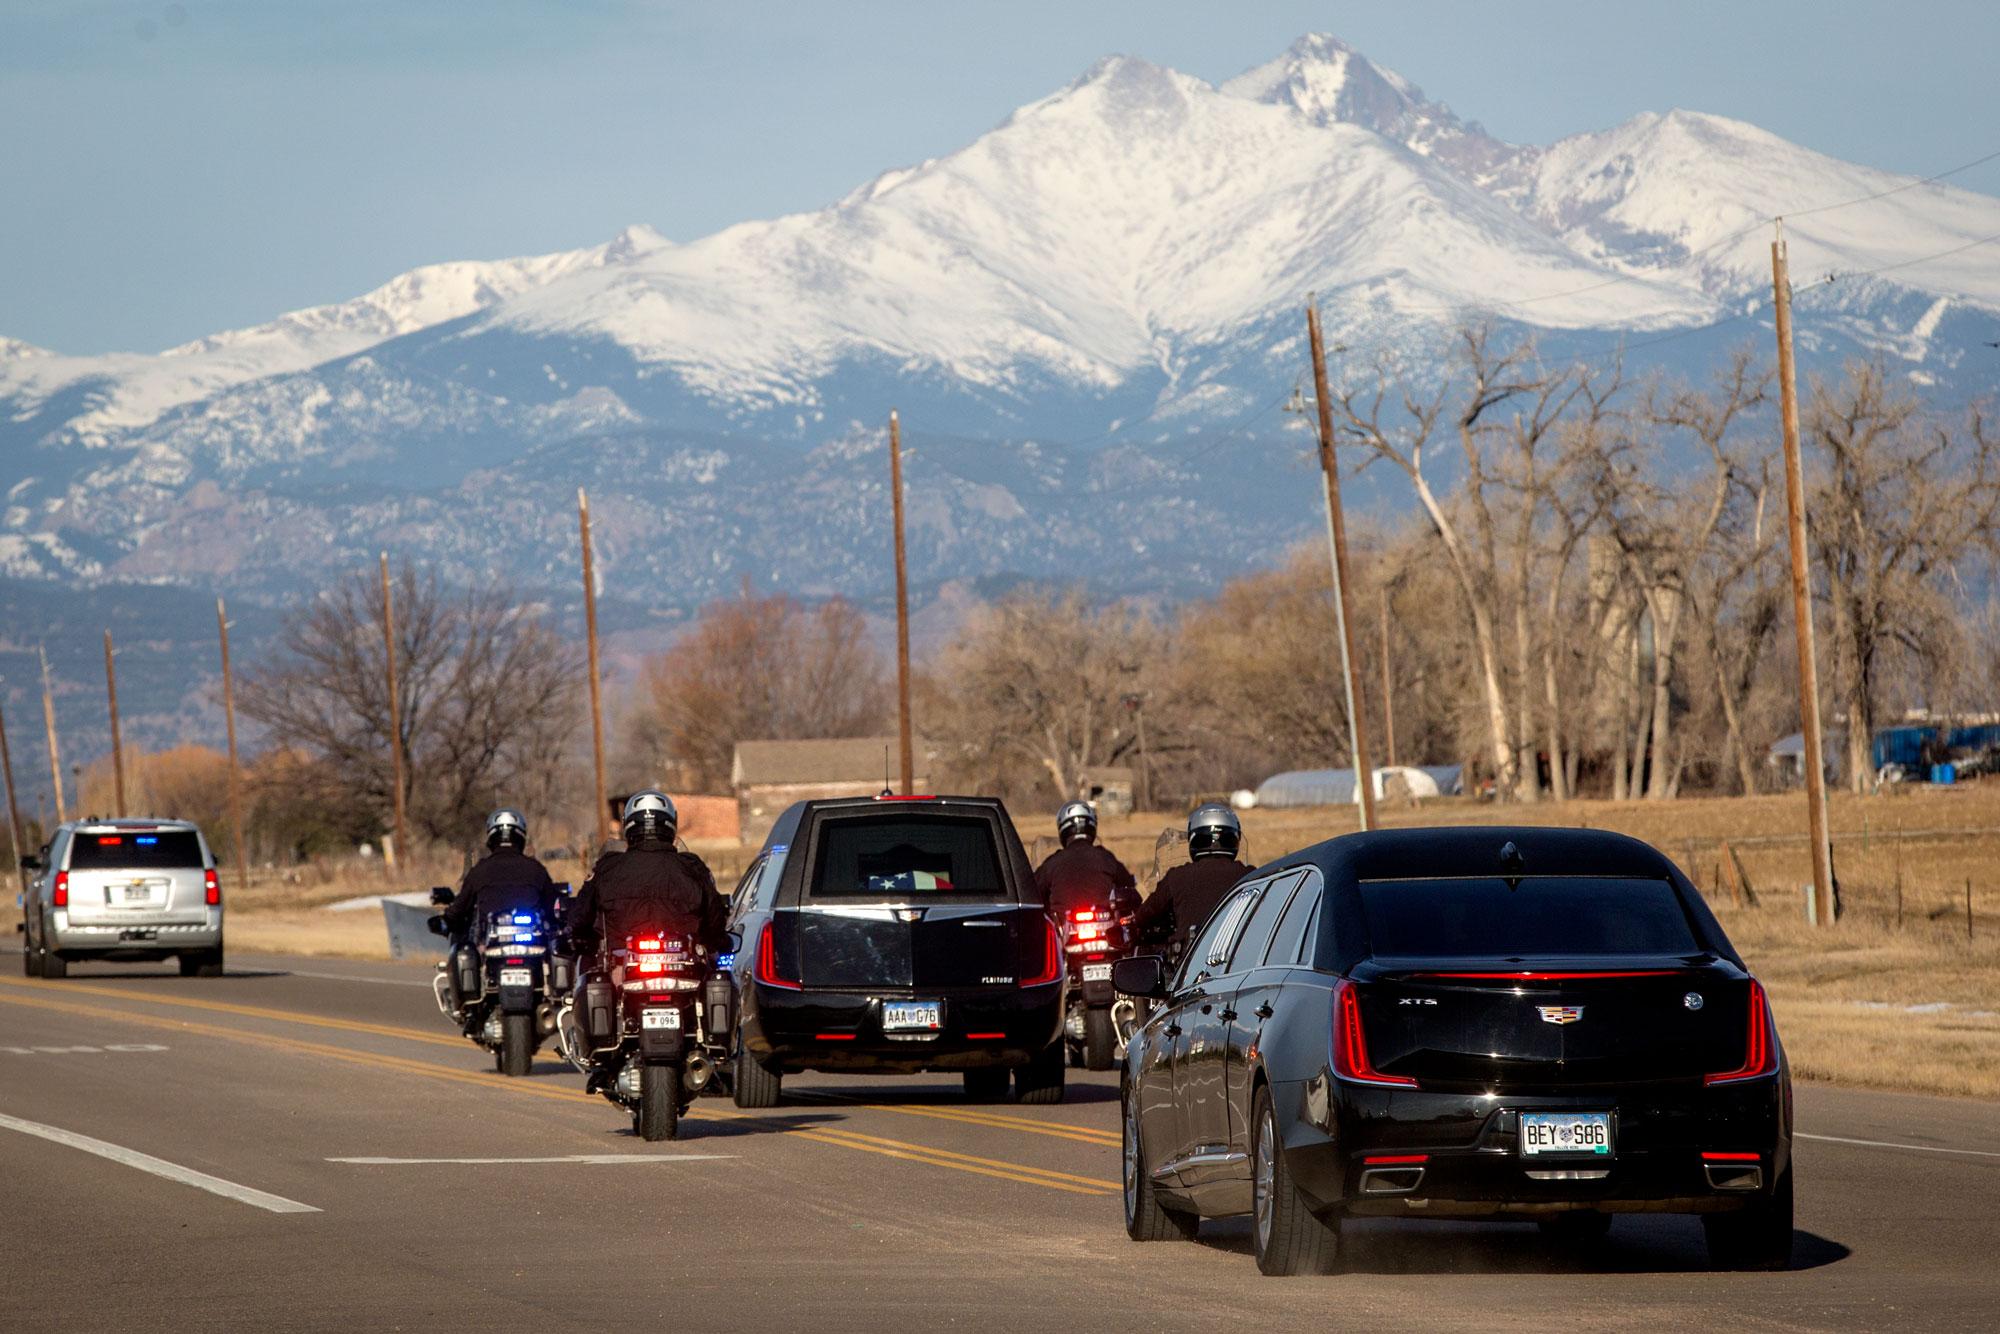 Photo: Cpl. Dan Groves Funeral 2 | Hearse And Longs Peak - HVD